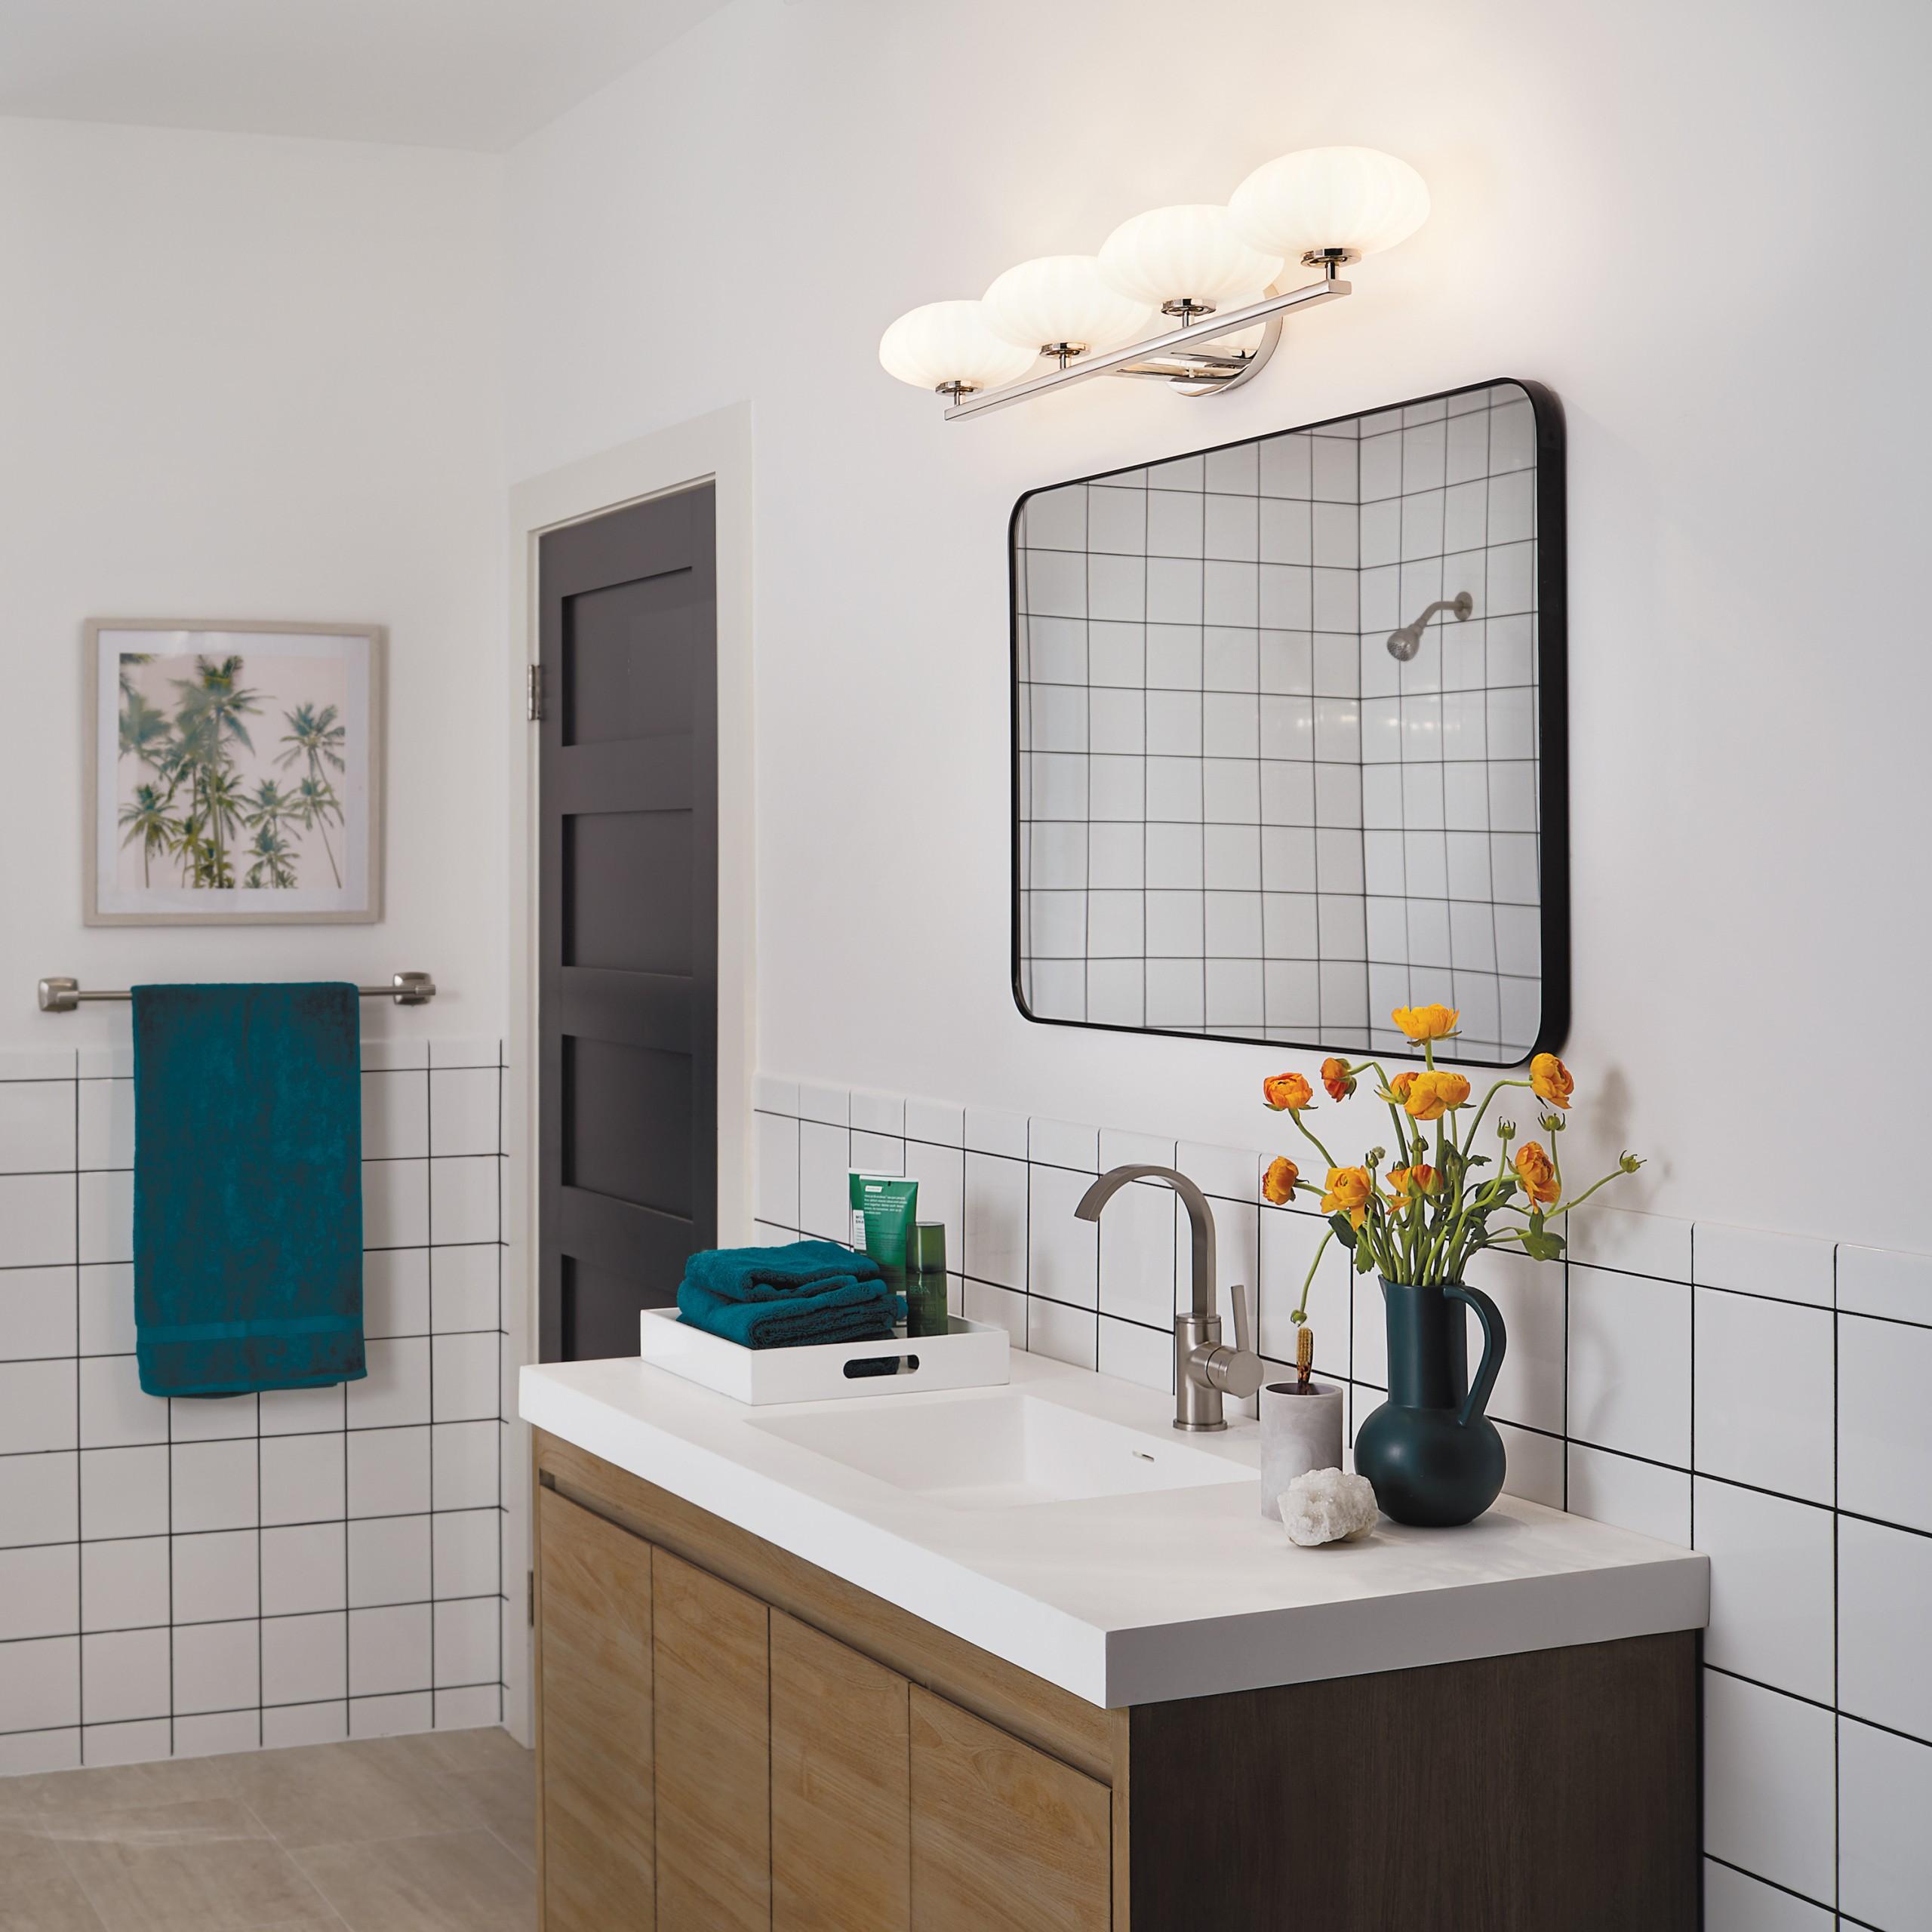 bright, tranquil bathroom